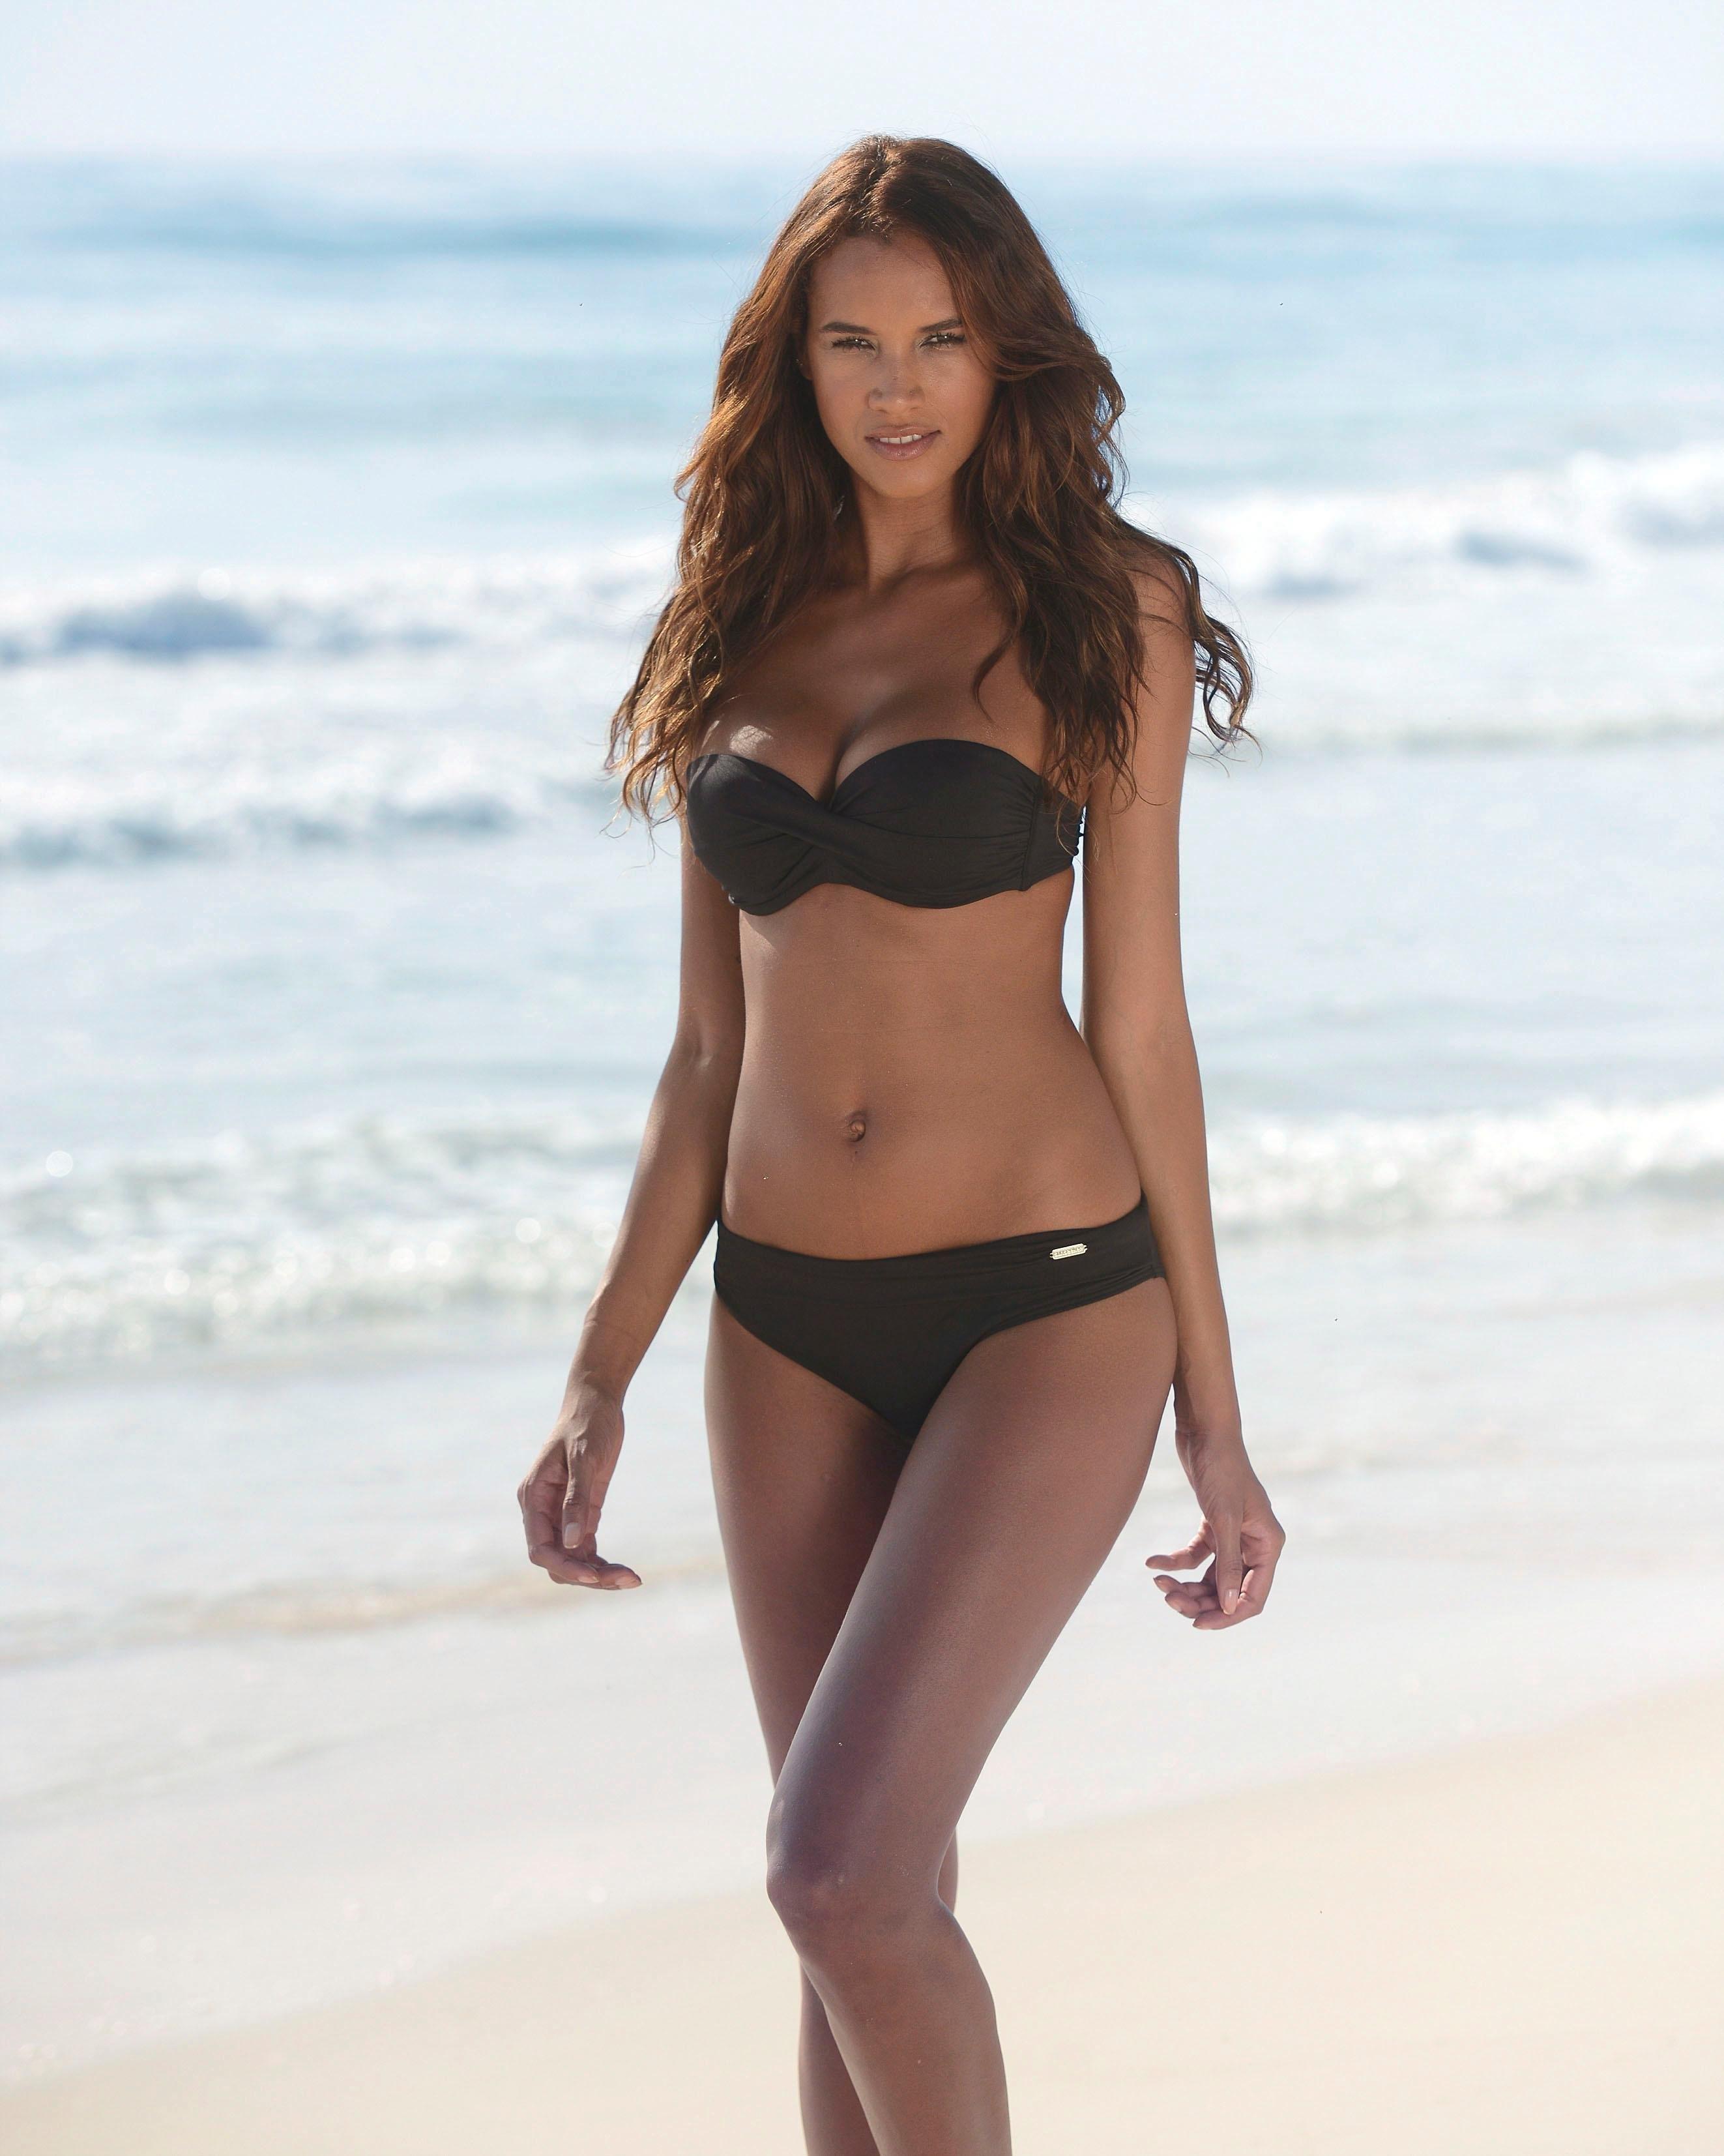 Sunseeker Bikinibroekje voordelig en veilig online kopen